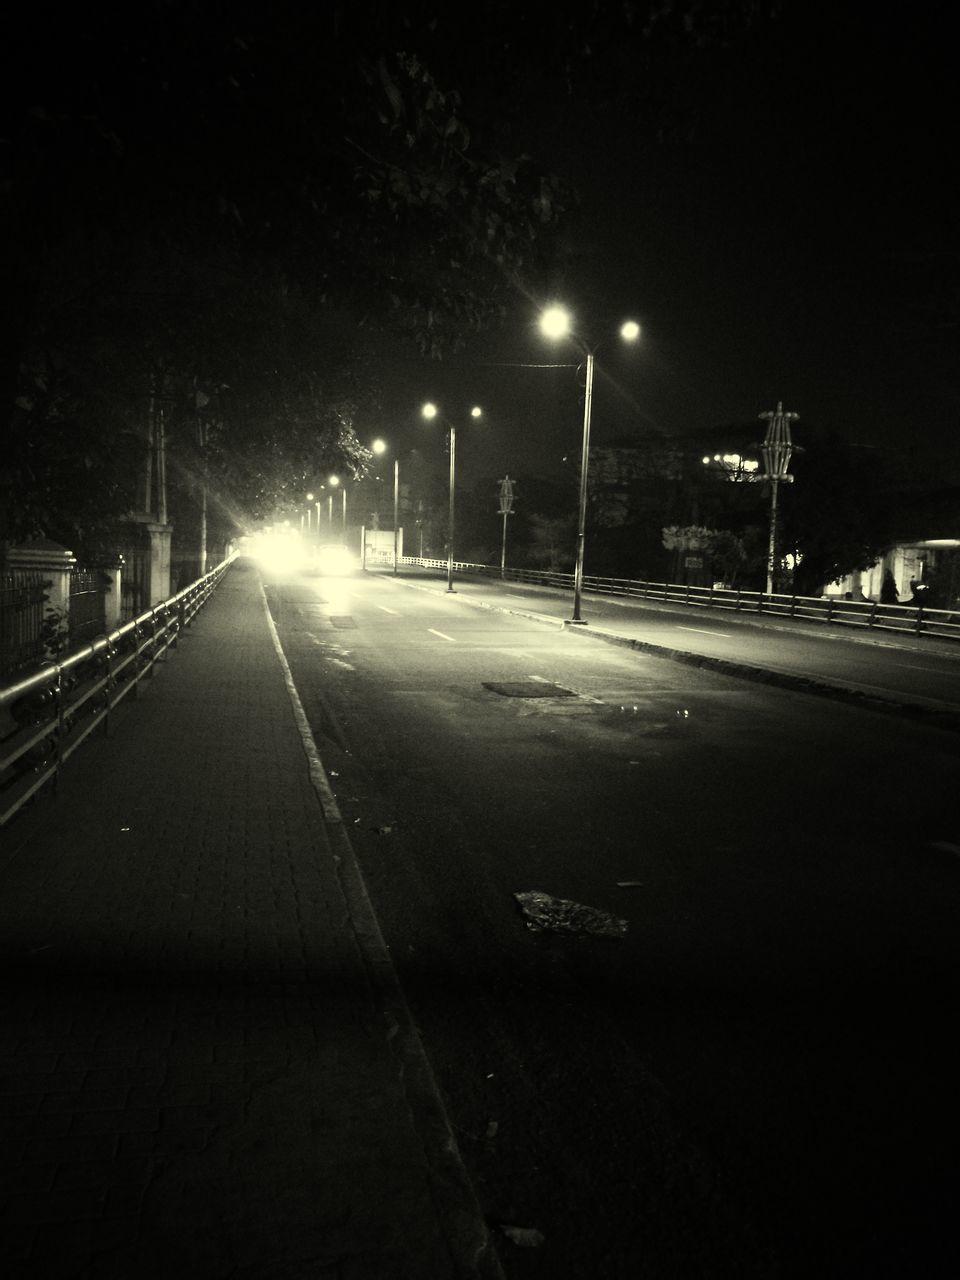 night, illuminated, transportation, street light, road, no people, outdoors, the way forward, railroad track, sky, city, nature